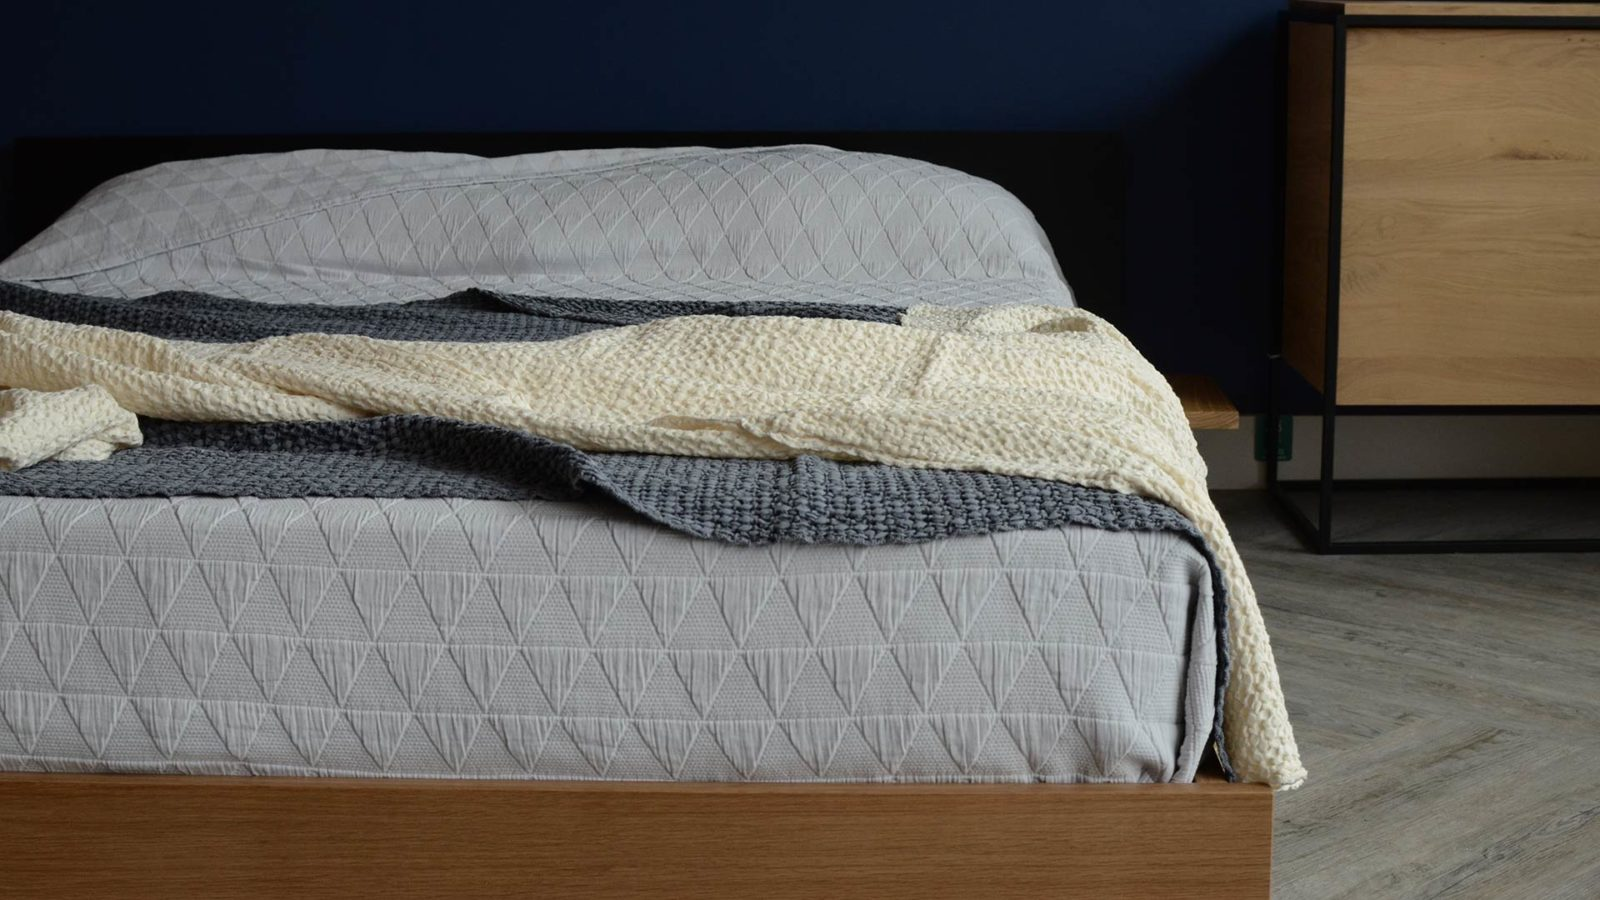 honeycomb-throws-on-kulu-grey-and-cream